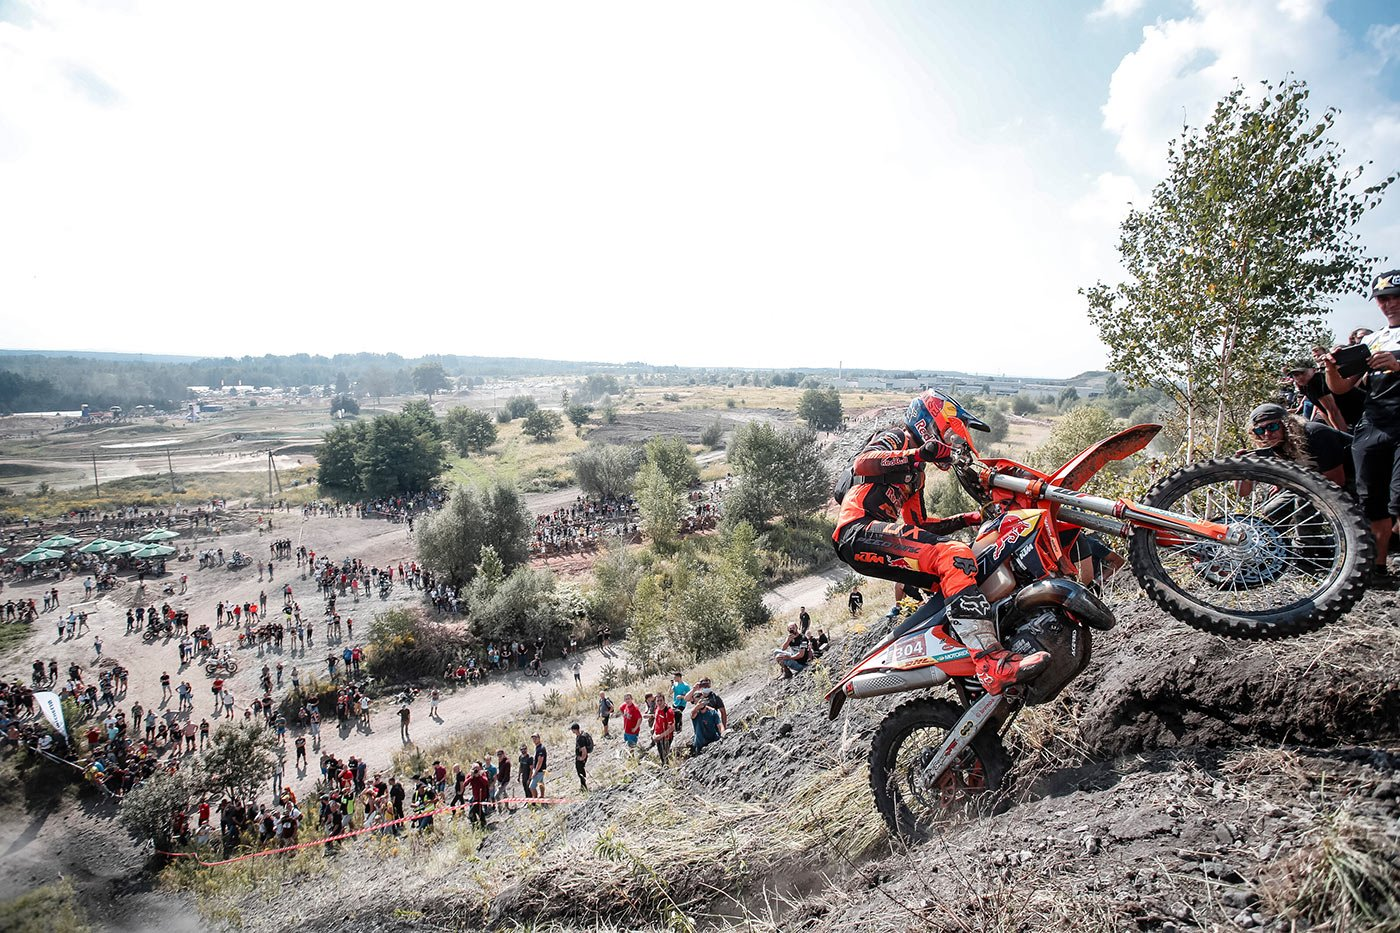 FIM Hard Enduro World Championship rider Manuel Lettenbichler